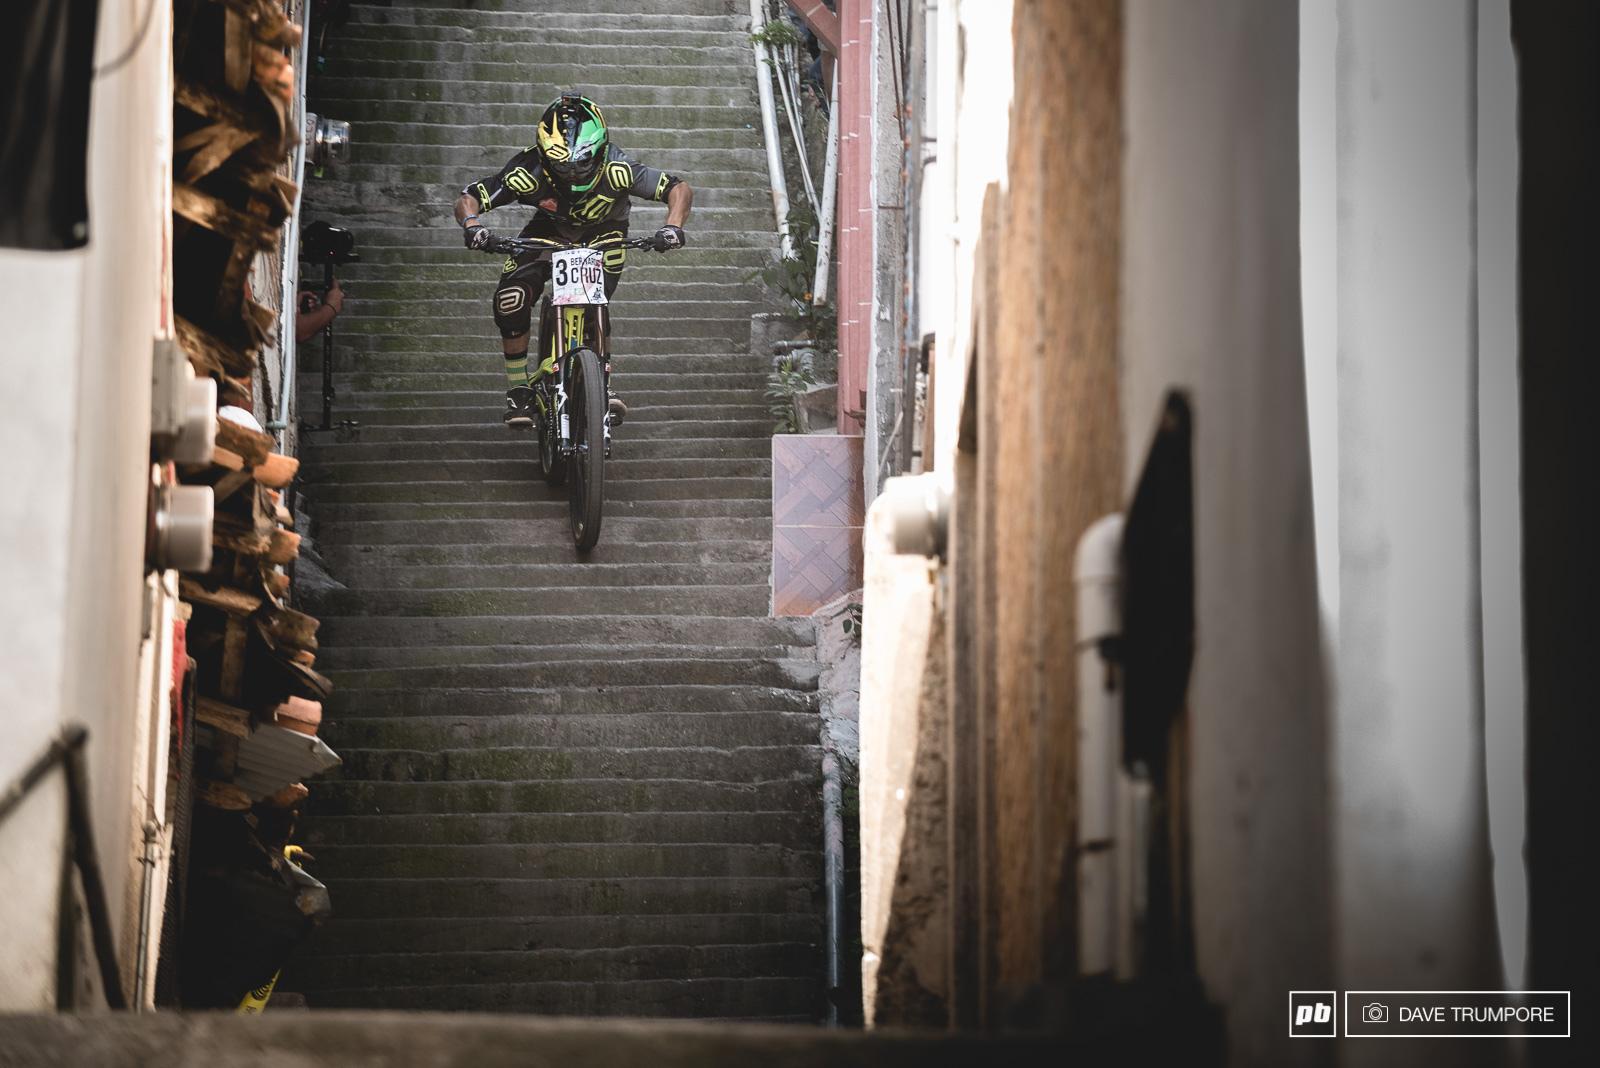 No one hits stairs as fast as Bernardo Cruz.